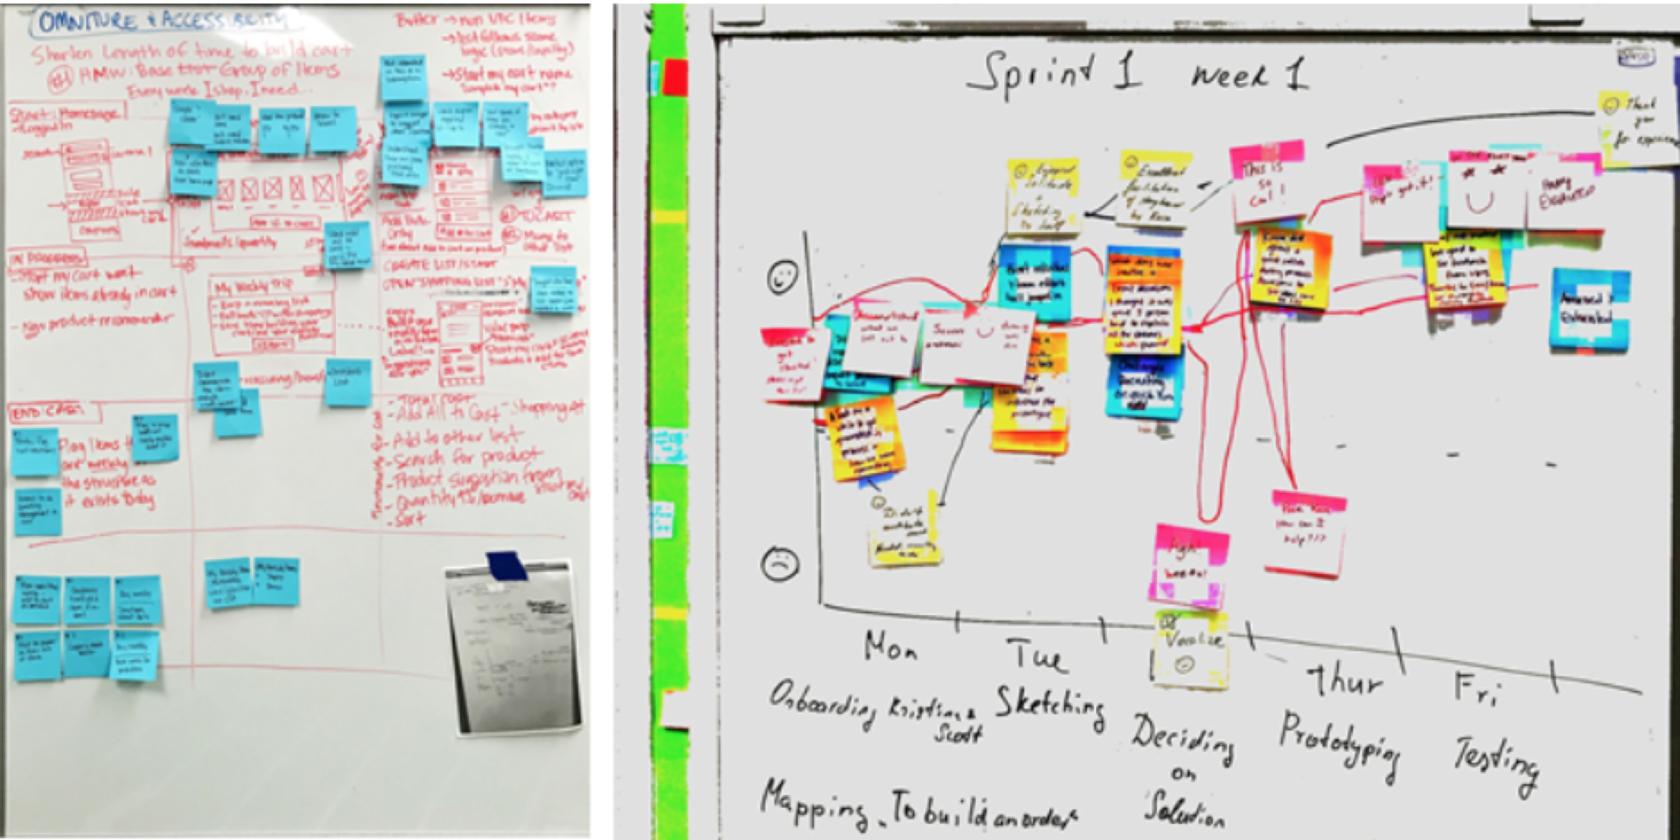 UXDC meetup. Design sprint white-boarding workshop